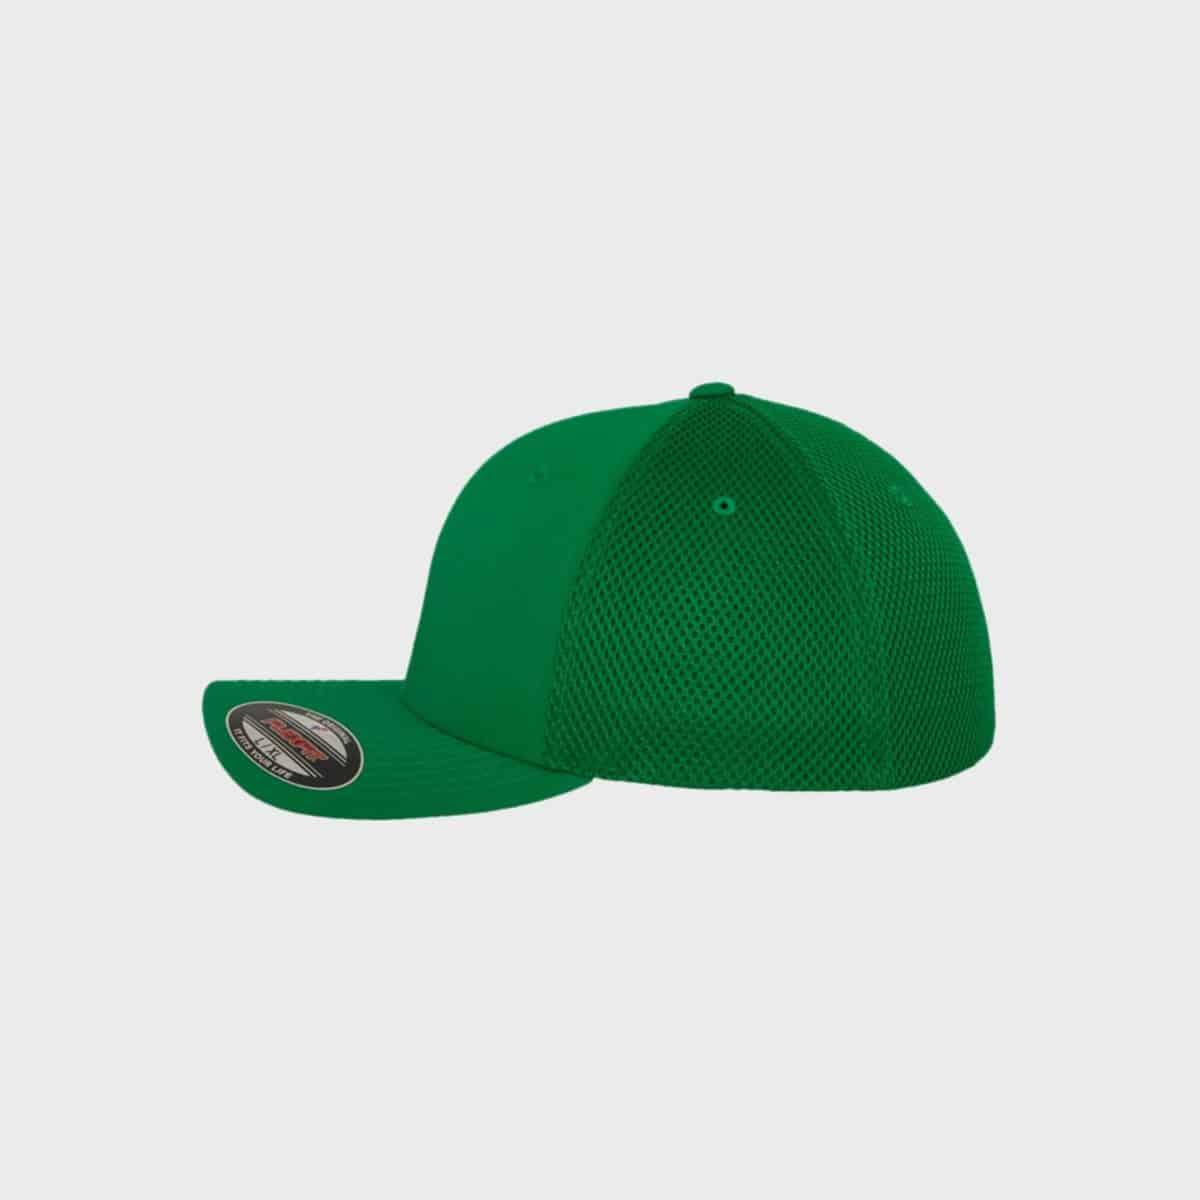 Flexfit FlexfitCaps FFE 6533 Green Side